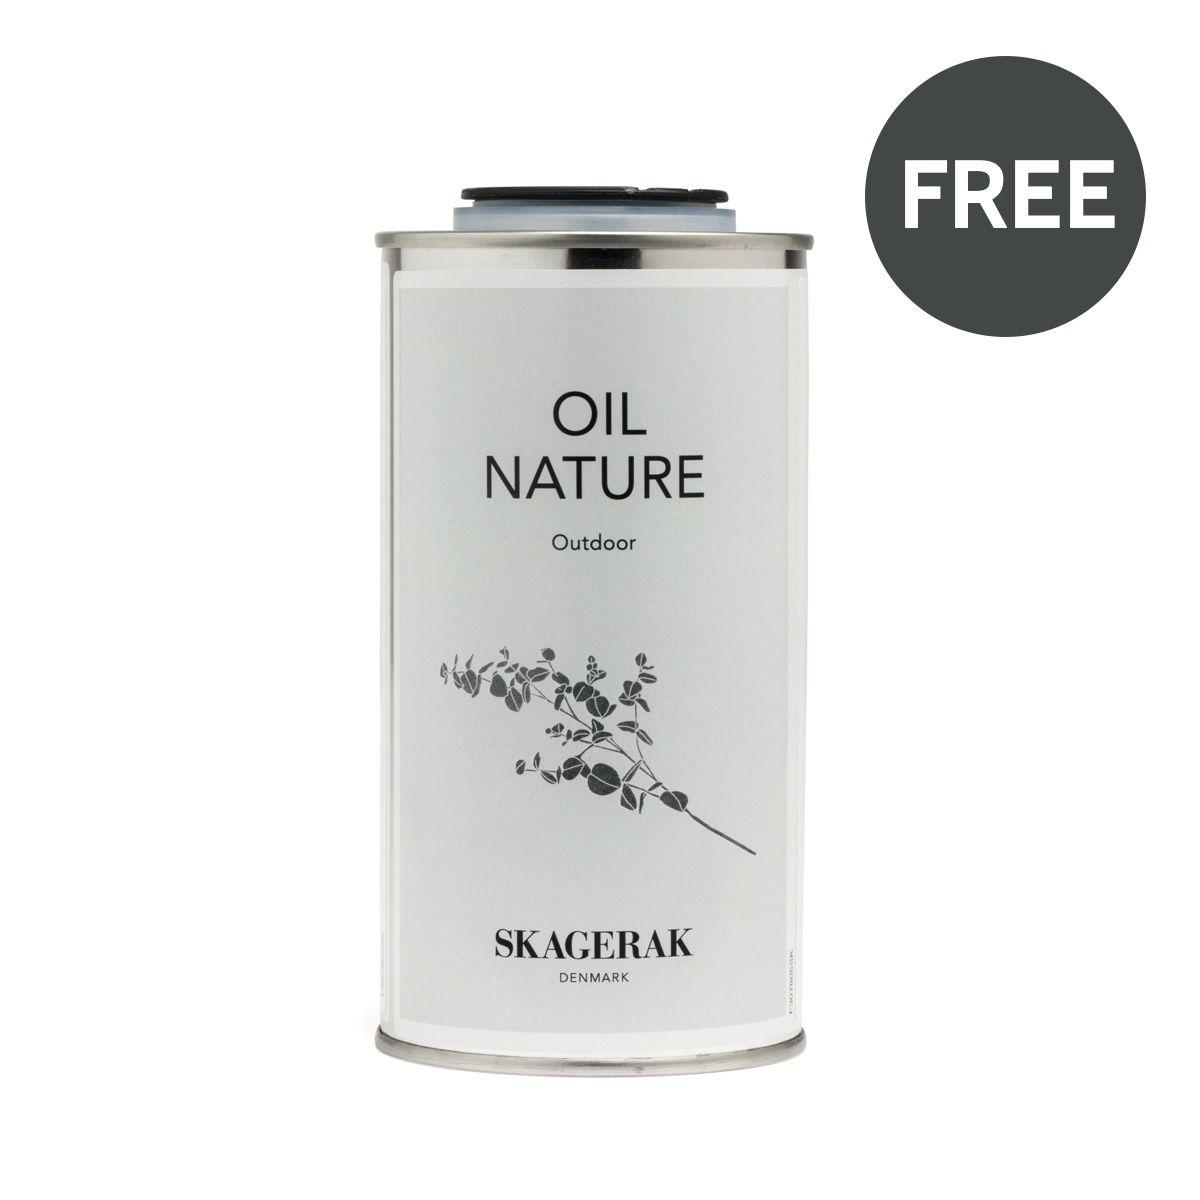 Complimentary maintenance oil